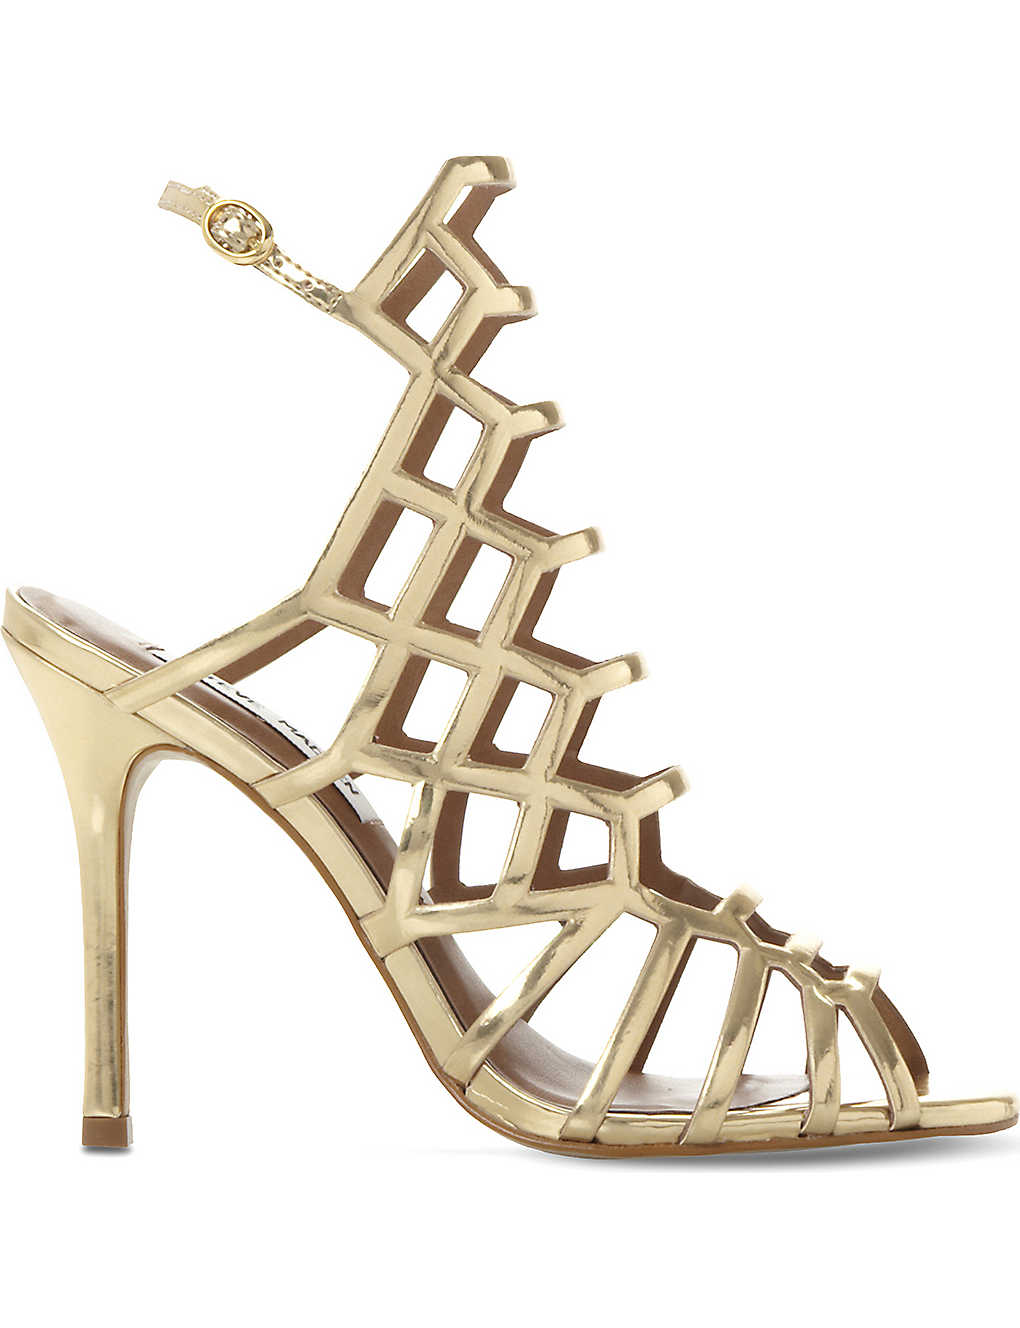 3e228b46f85 STEVE MADDEN - Slithur leather heeled sandals | Selfridges.com